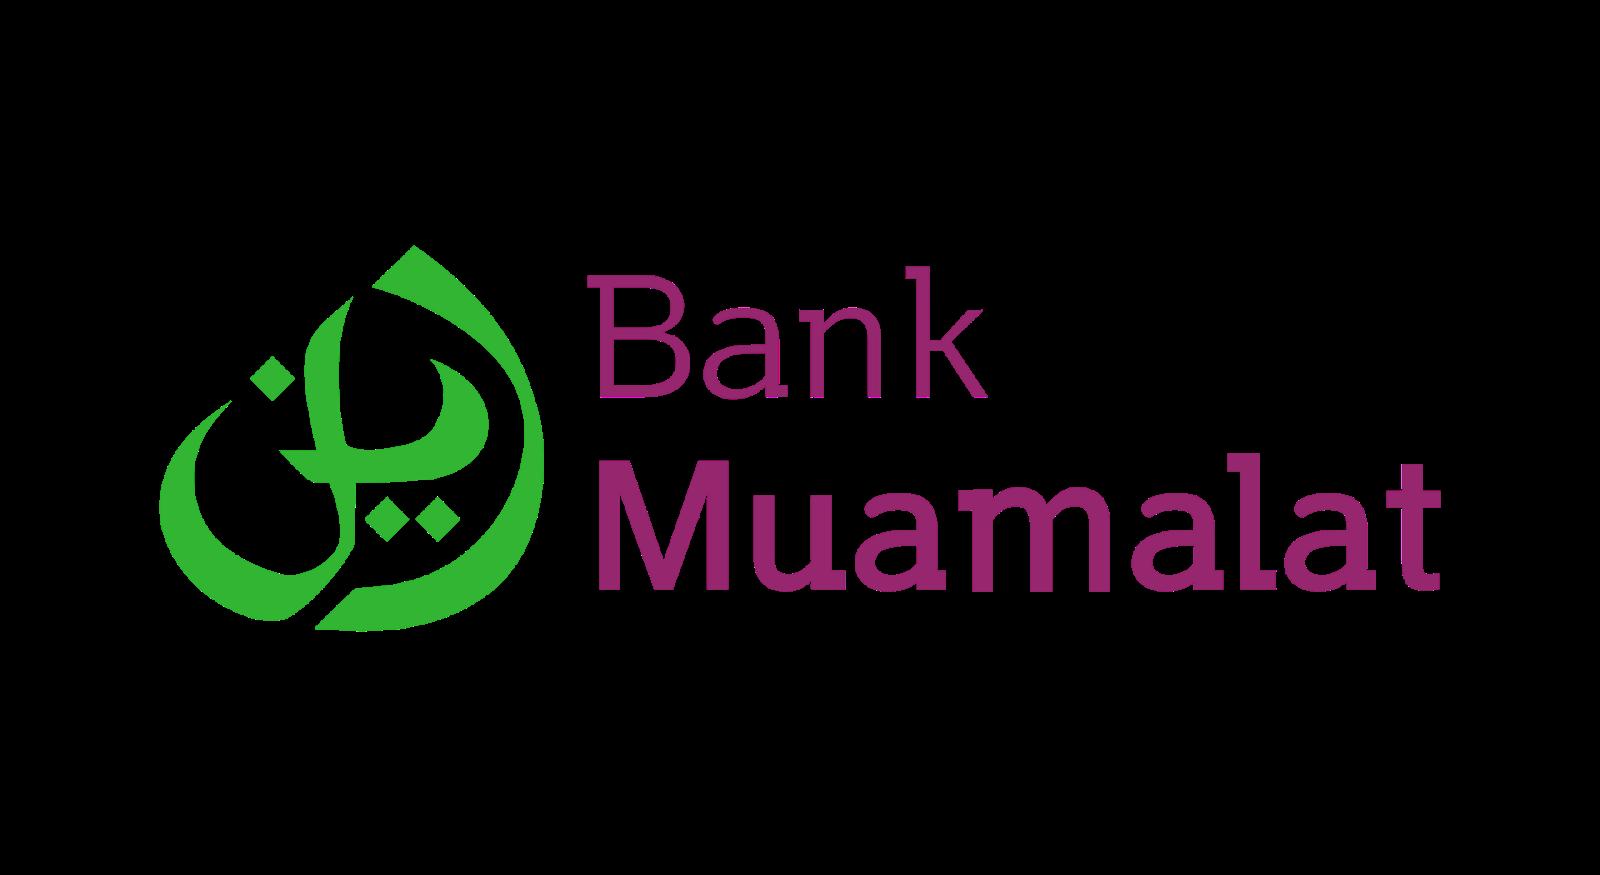 Logo Bank Muamalat Format PNG